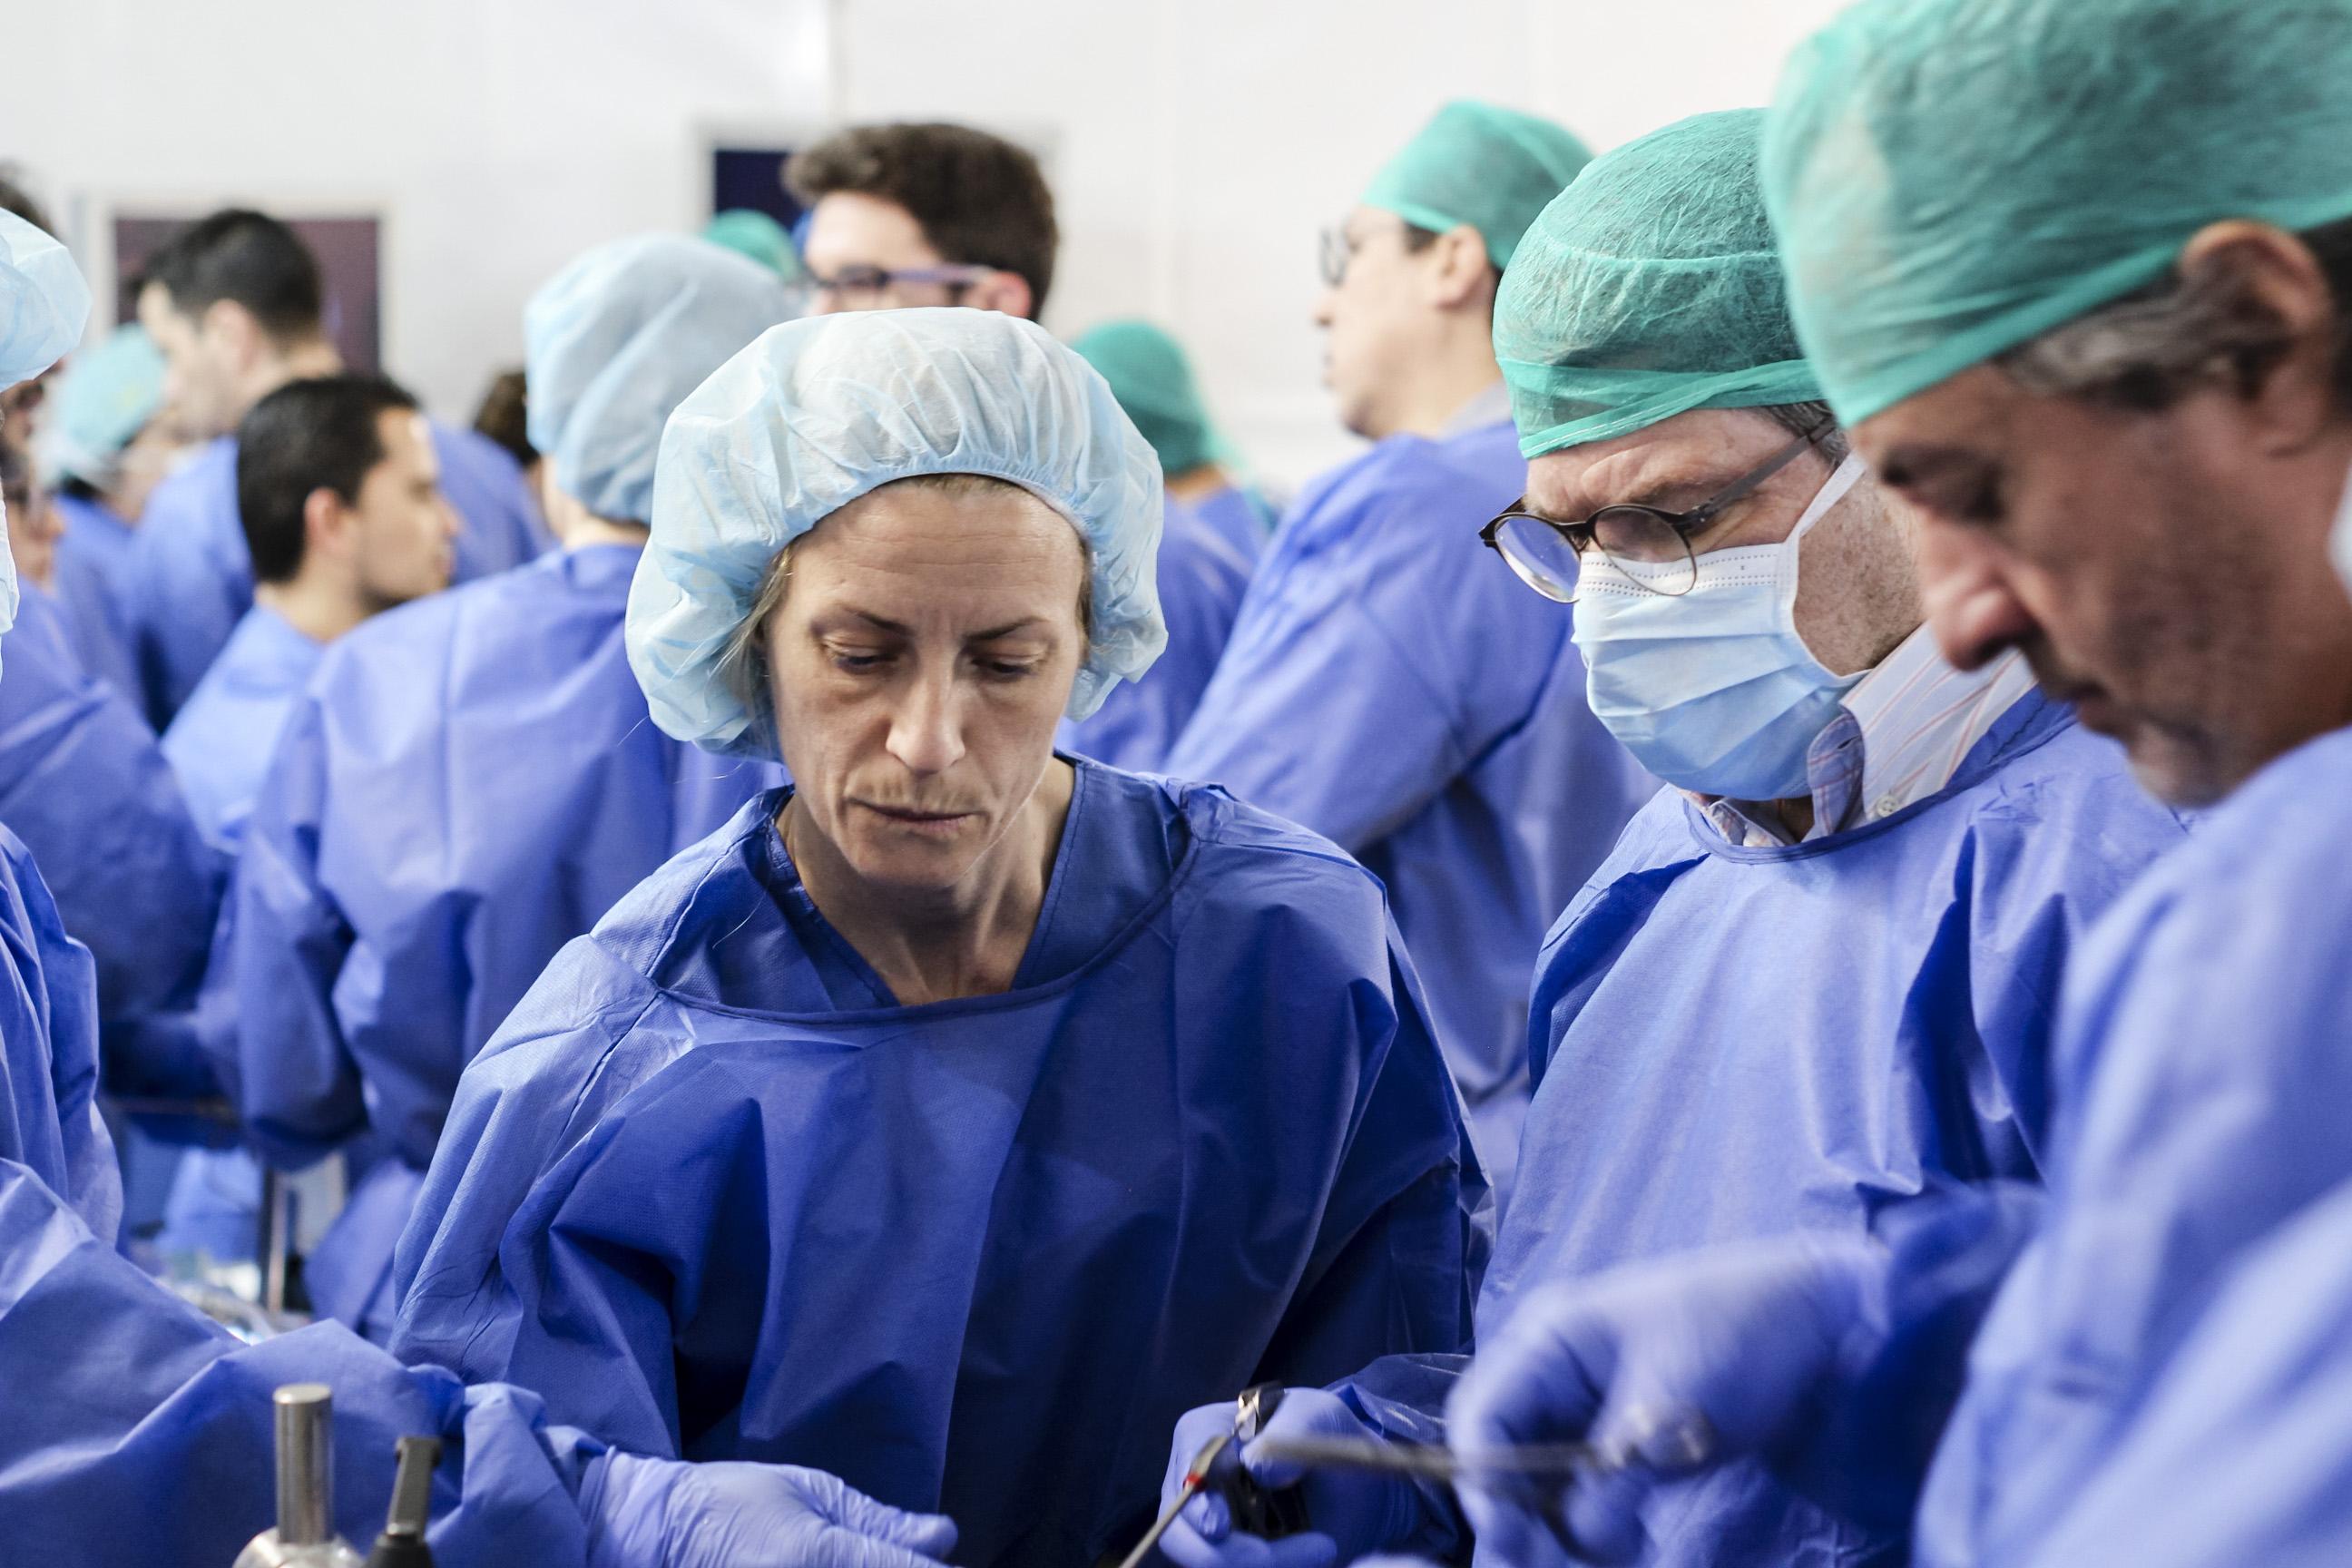 Practicas curso artroscopia compleja CEMTRO